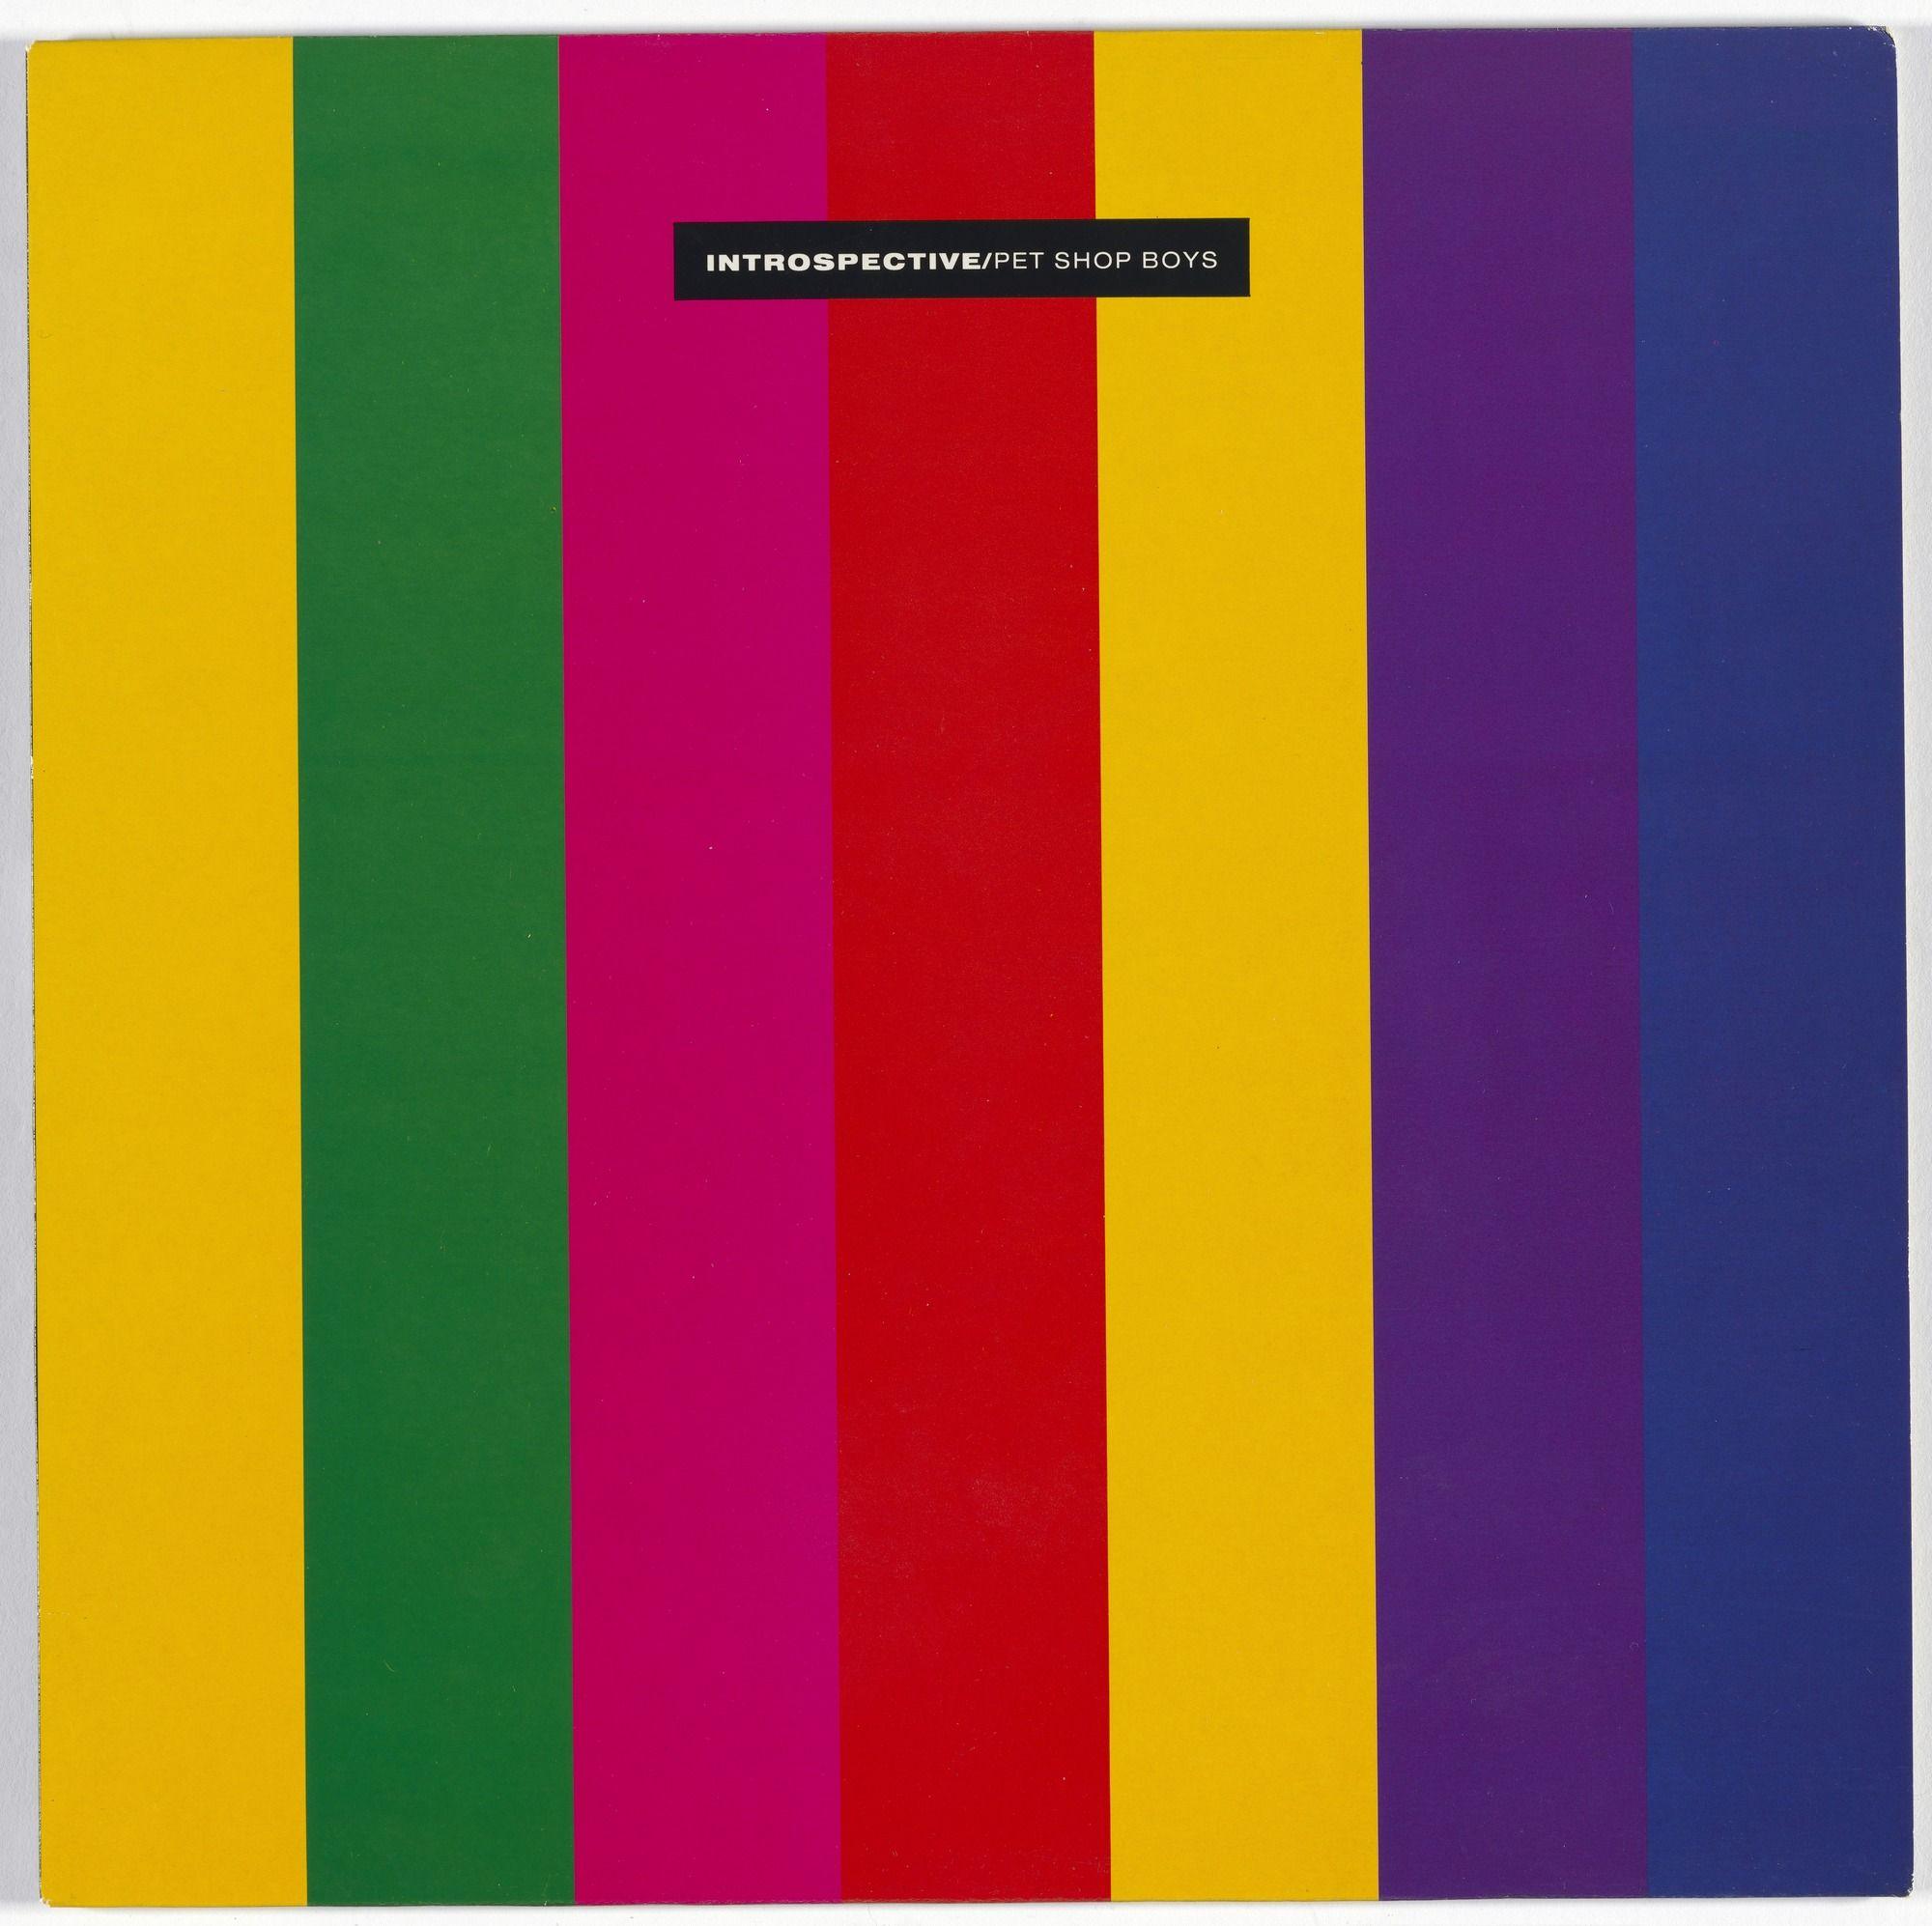 Mark Farrow Eric Watson Parlophone Records Album Cover For Pet